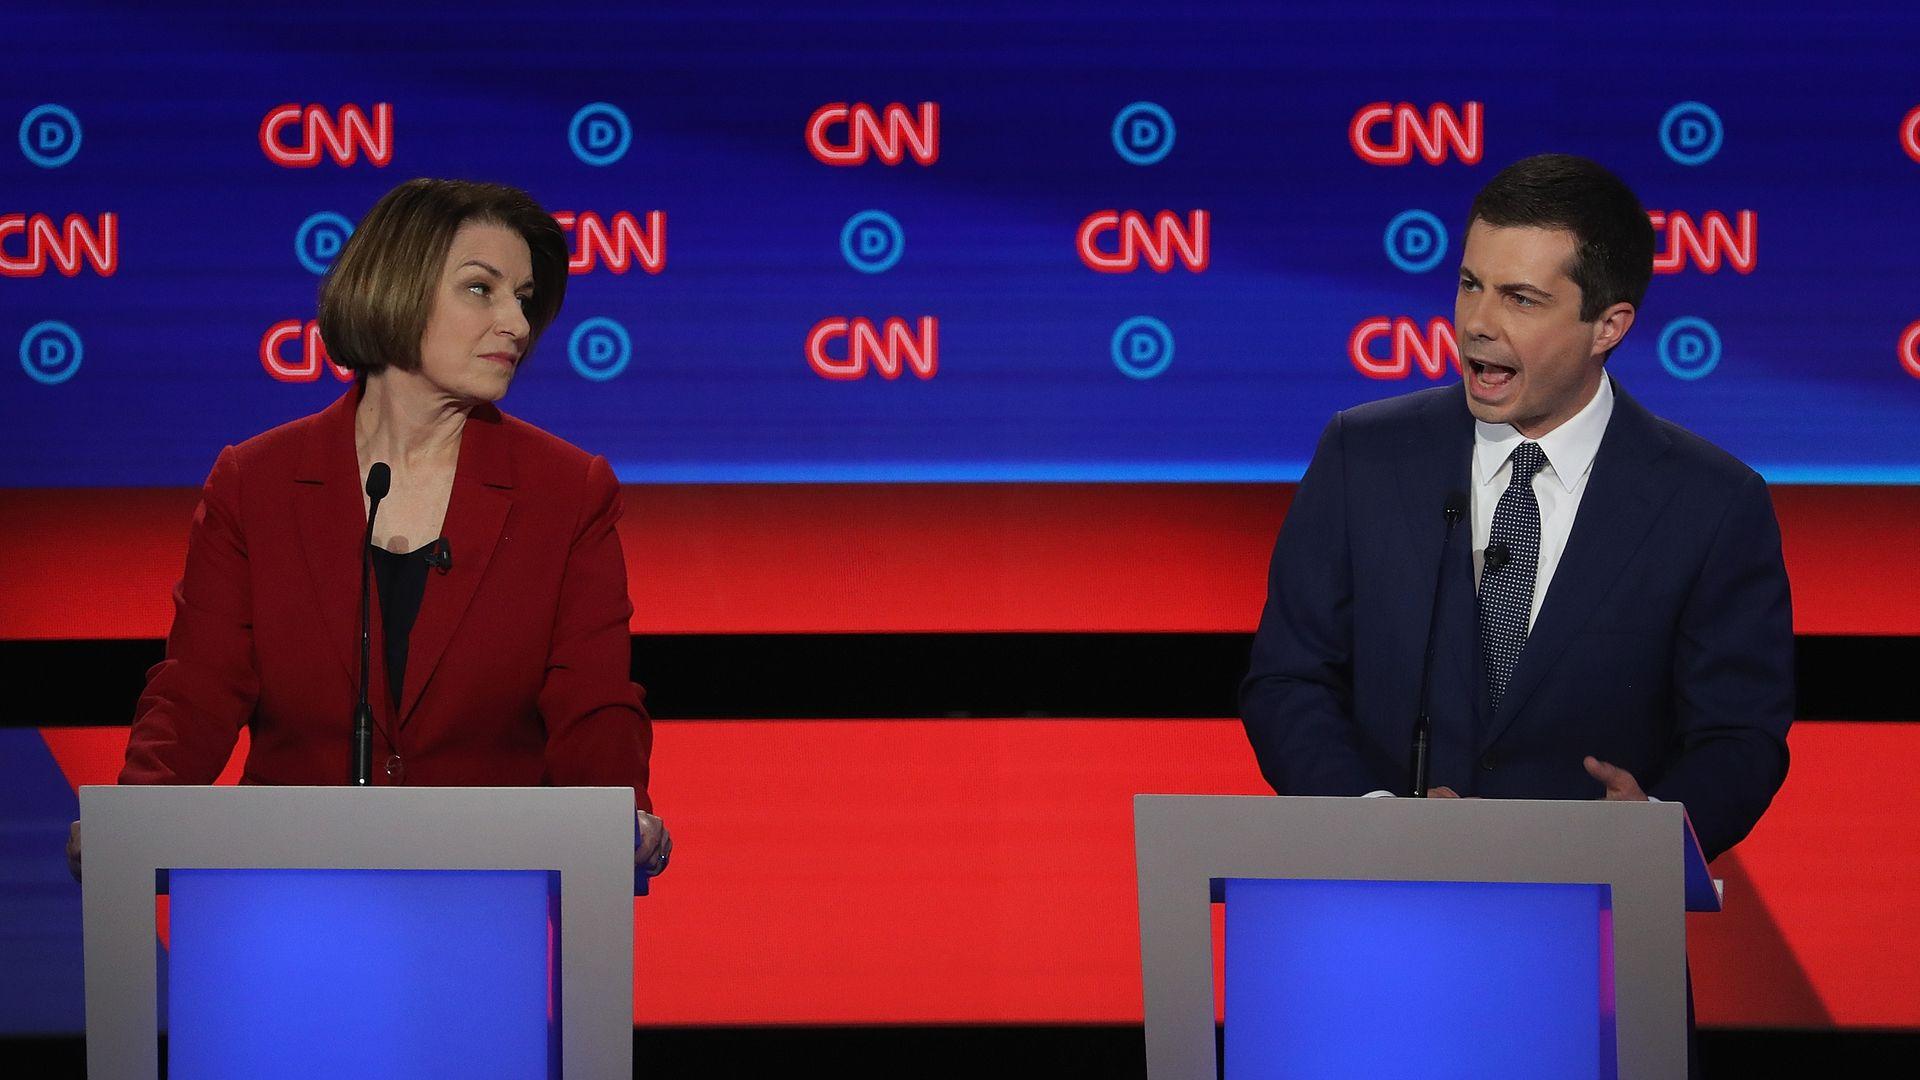 Buttigieg and Klobuchar rake in over $1 million each in 24 hours after debate